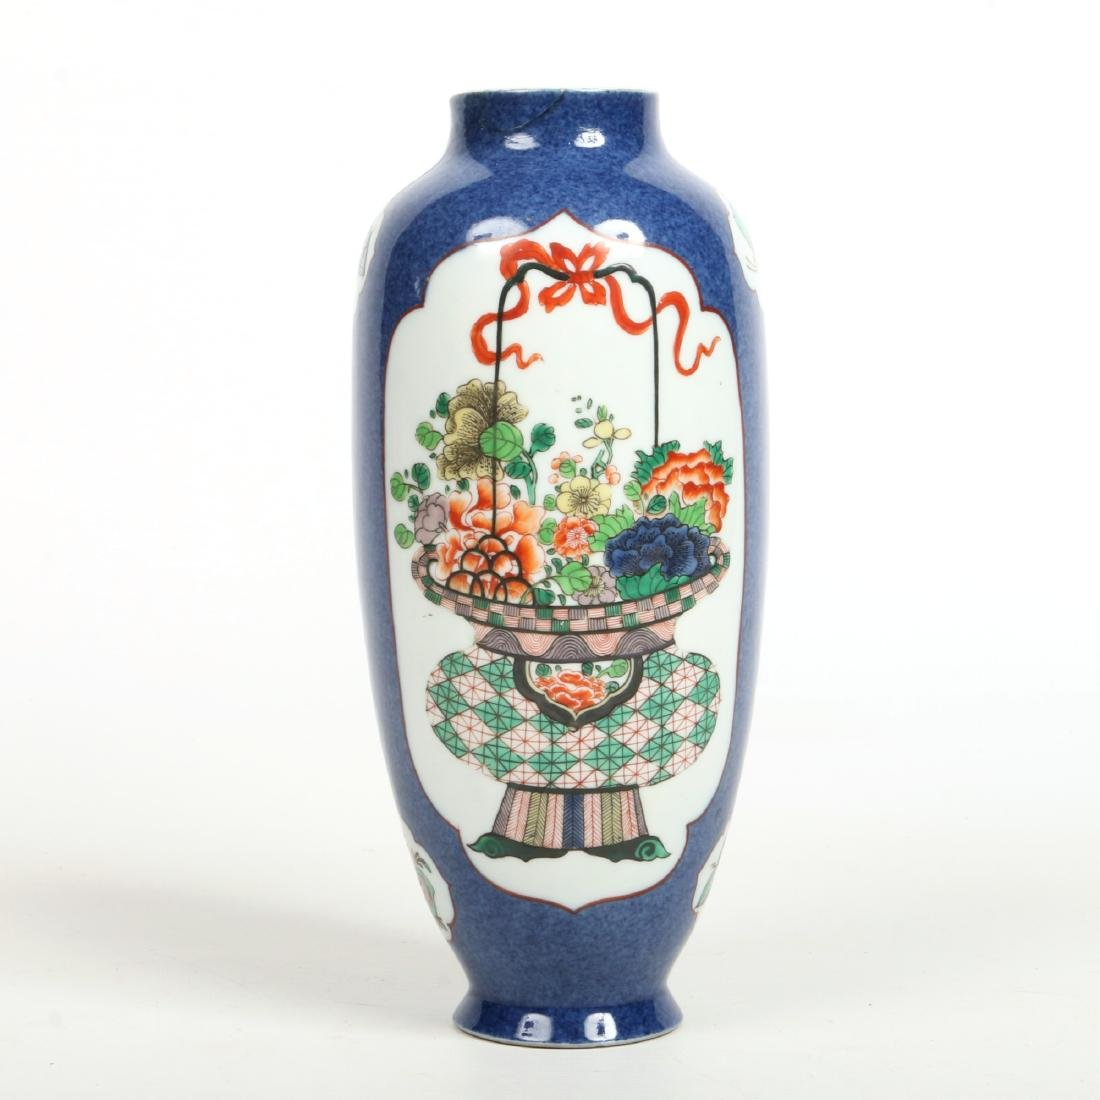 A 19th century Chinese Kangxi style powder blue ground